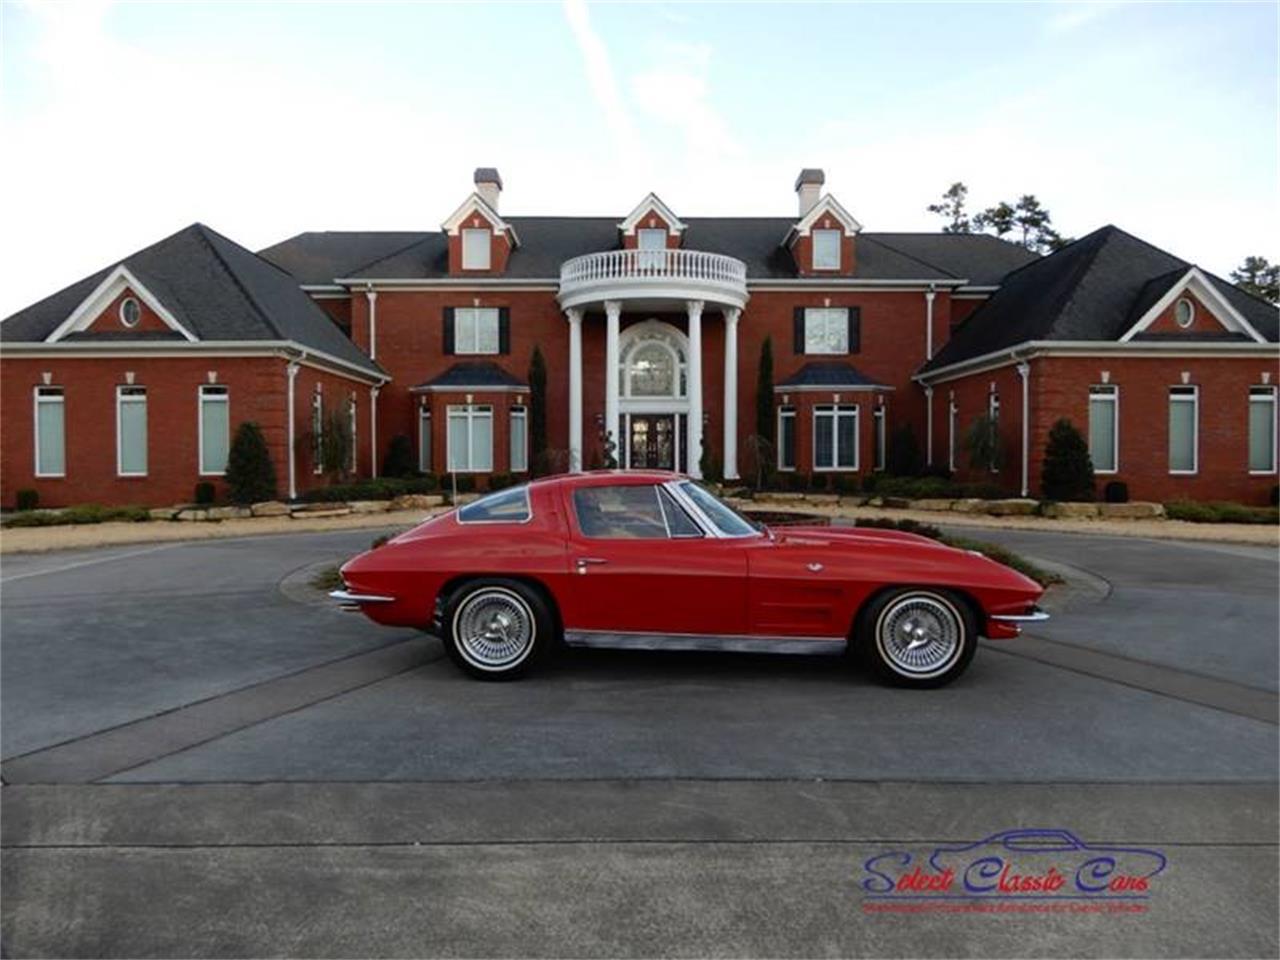 Large Picture of Classic 1963 Corvette located in Hiram Georgia - $89,500.00 - QE3V